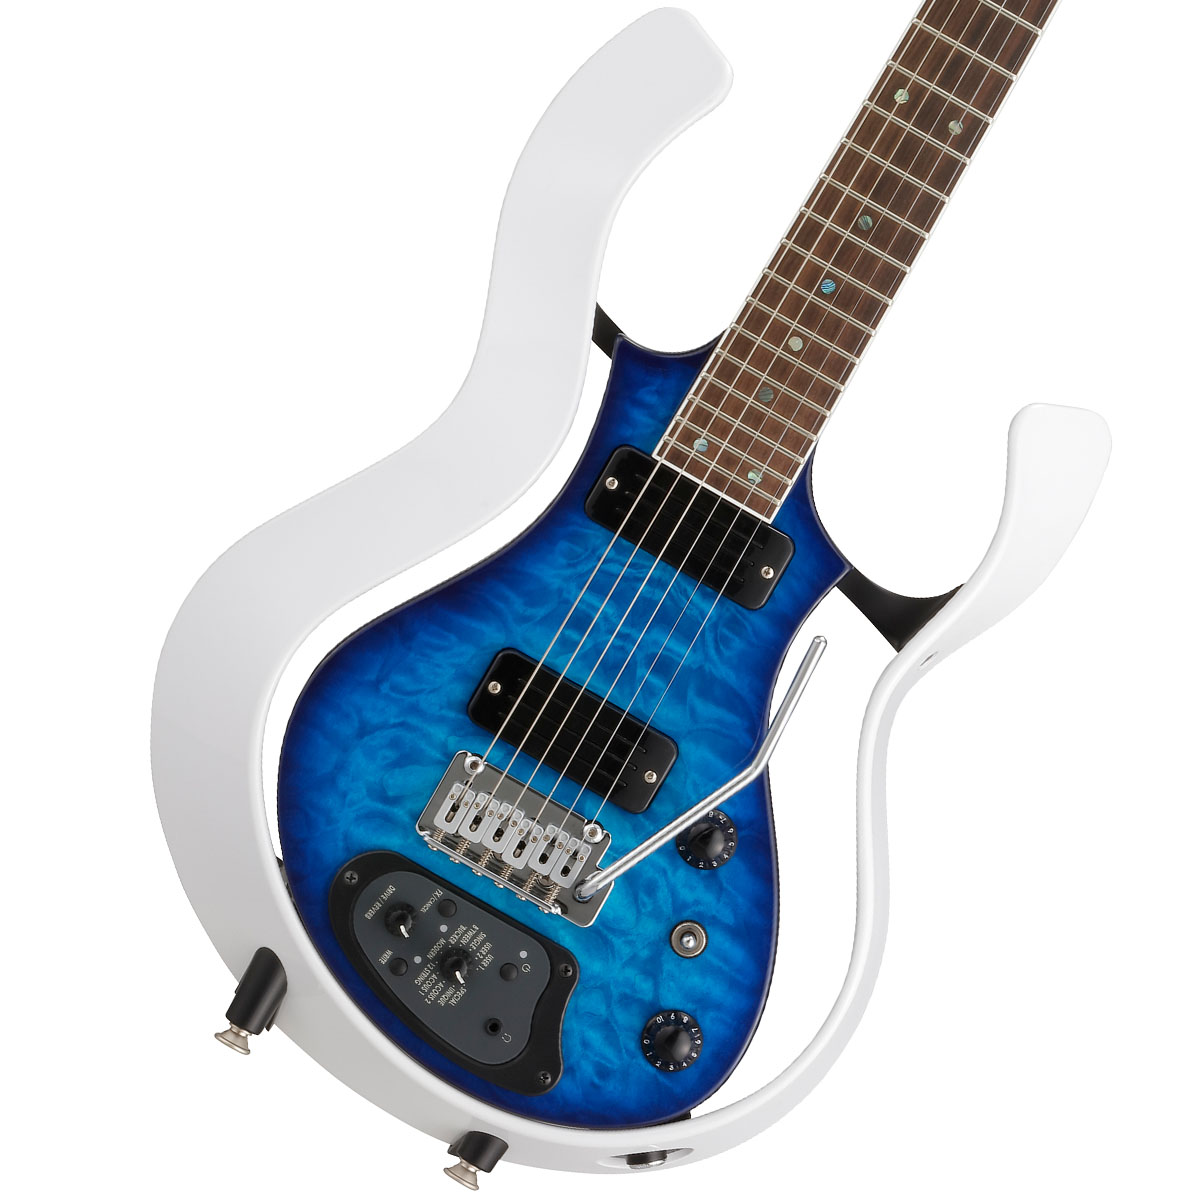 VOX / Modeling Electric Guitar Starstream Type 1-24 Metallic White Frame with Trans Blue/Qulted Maple Top (VSS-1-24MWTL-Q), akibainpulse:d4b6b026 --- afj21.jp